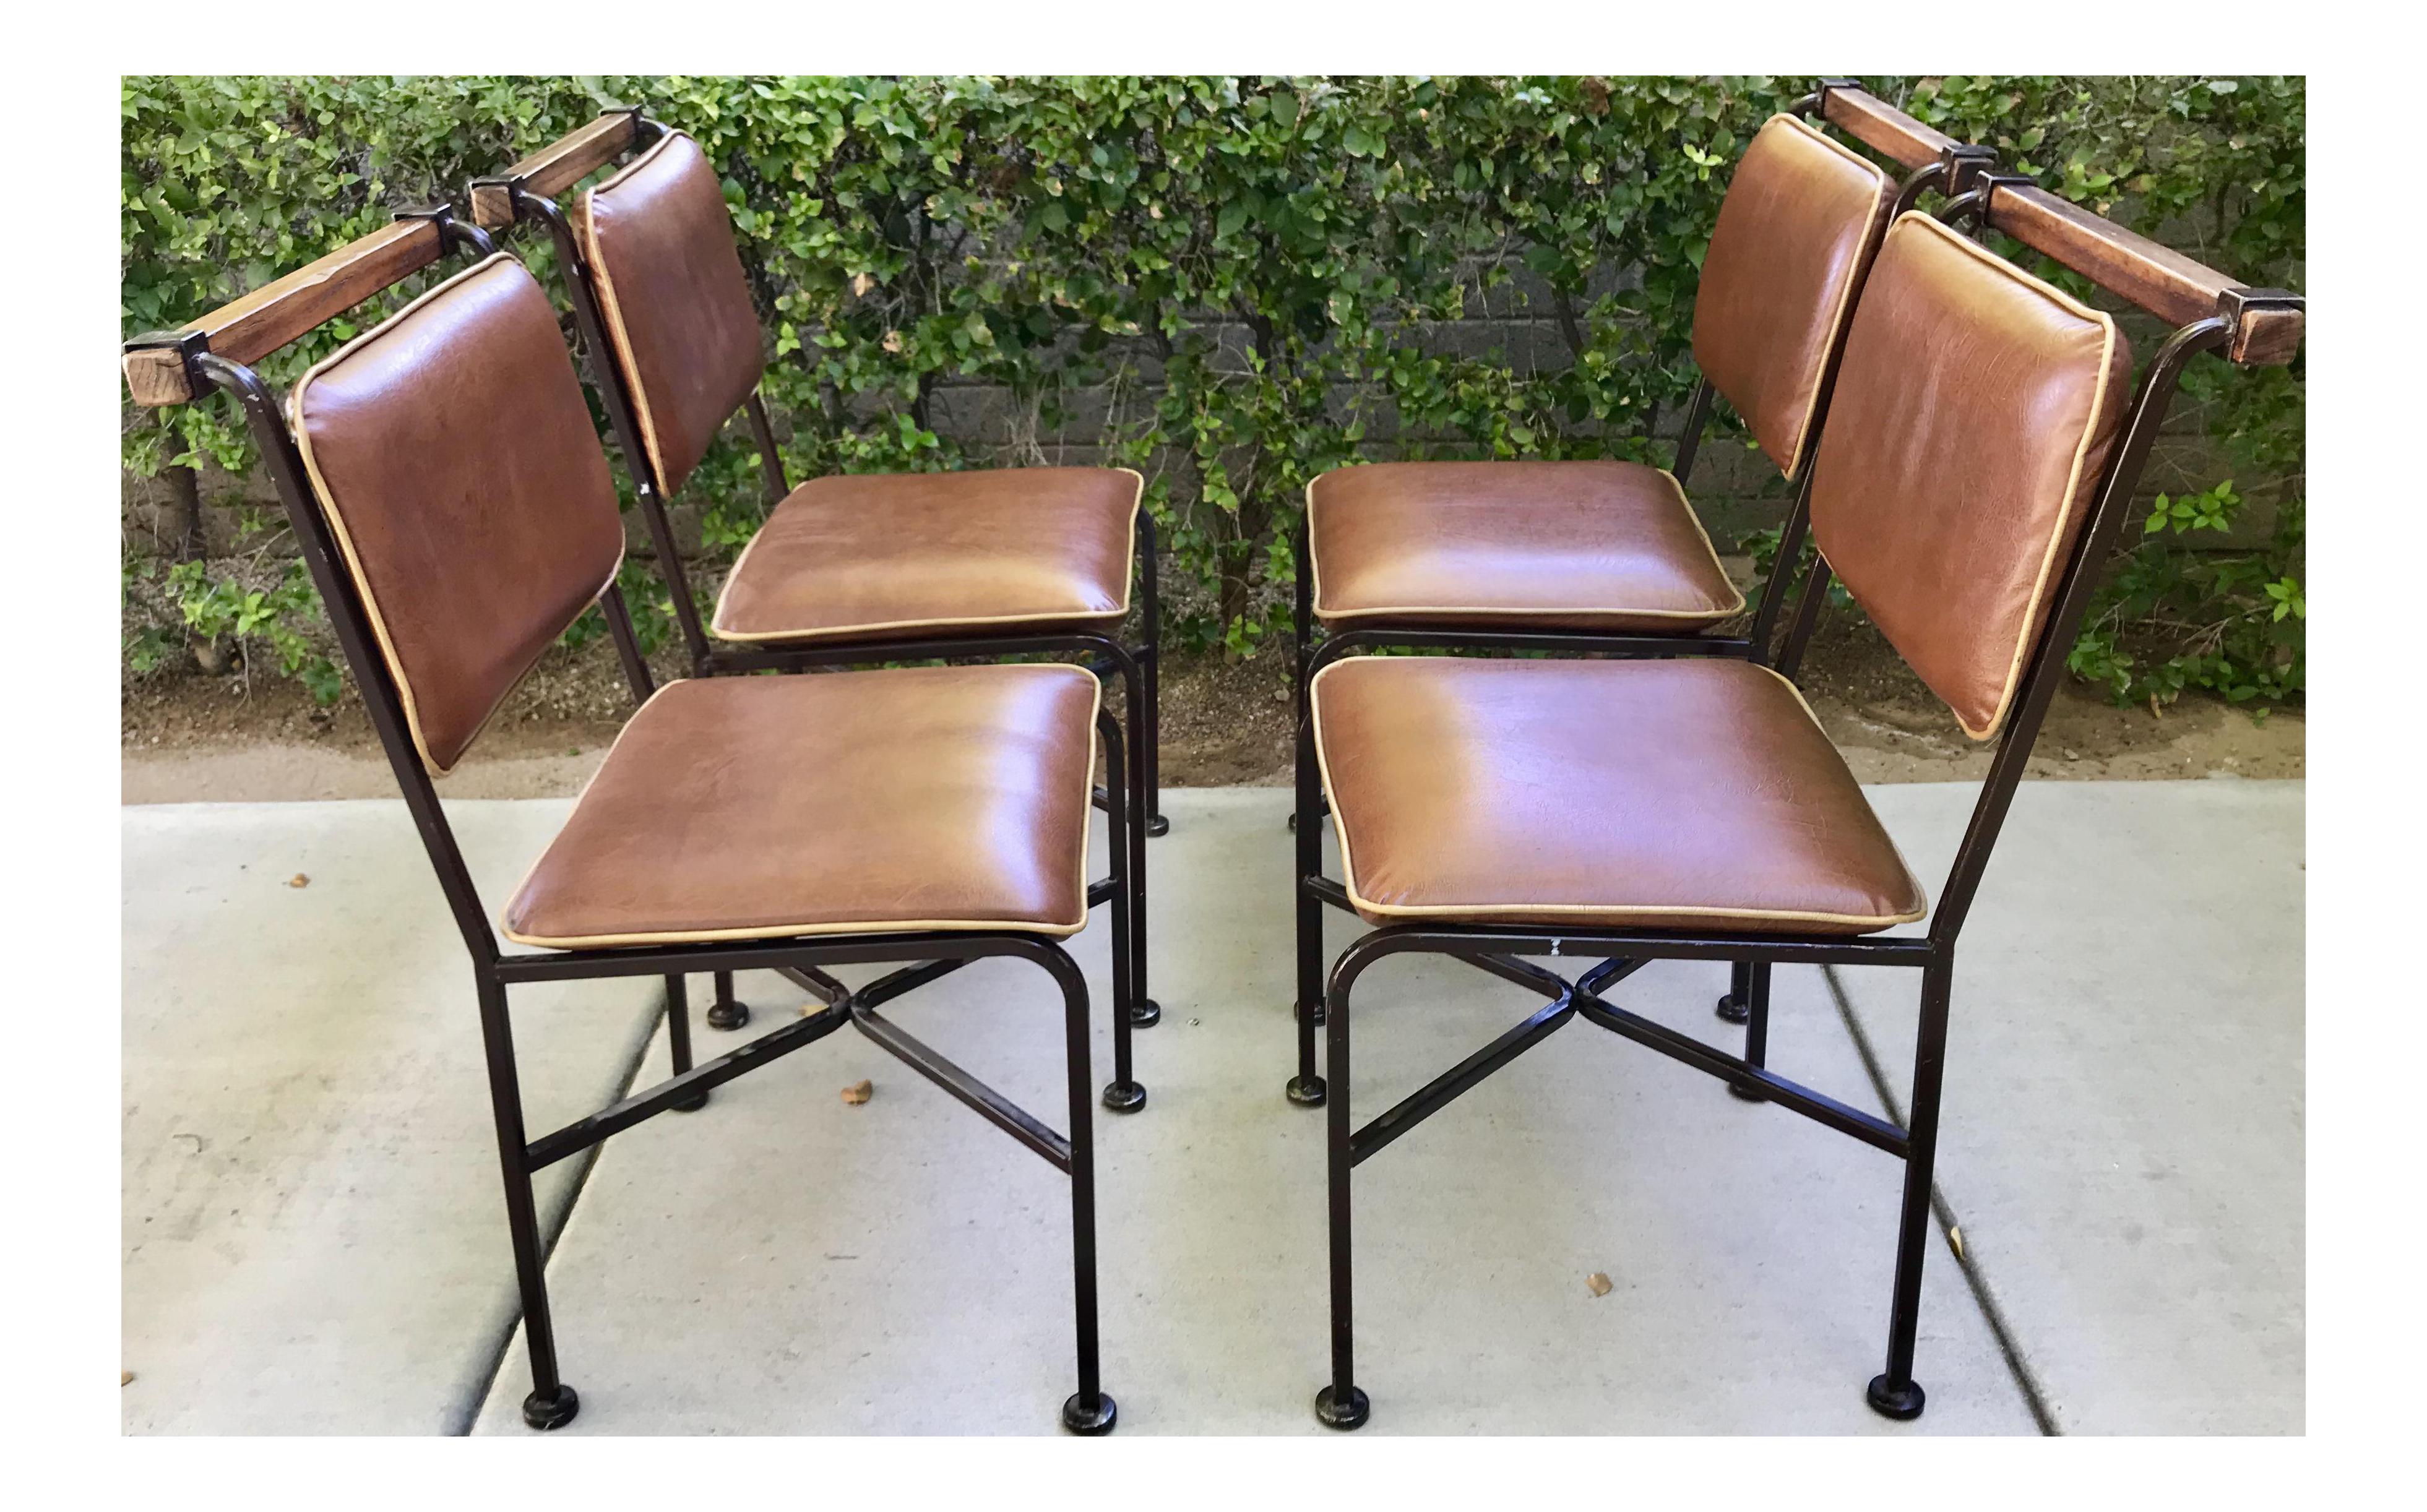 Rustic Modern Cleo Baldon Dining Chairs Set Of 4 Chairish